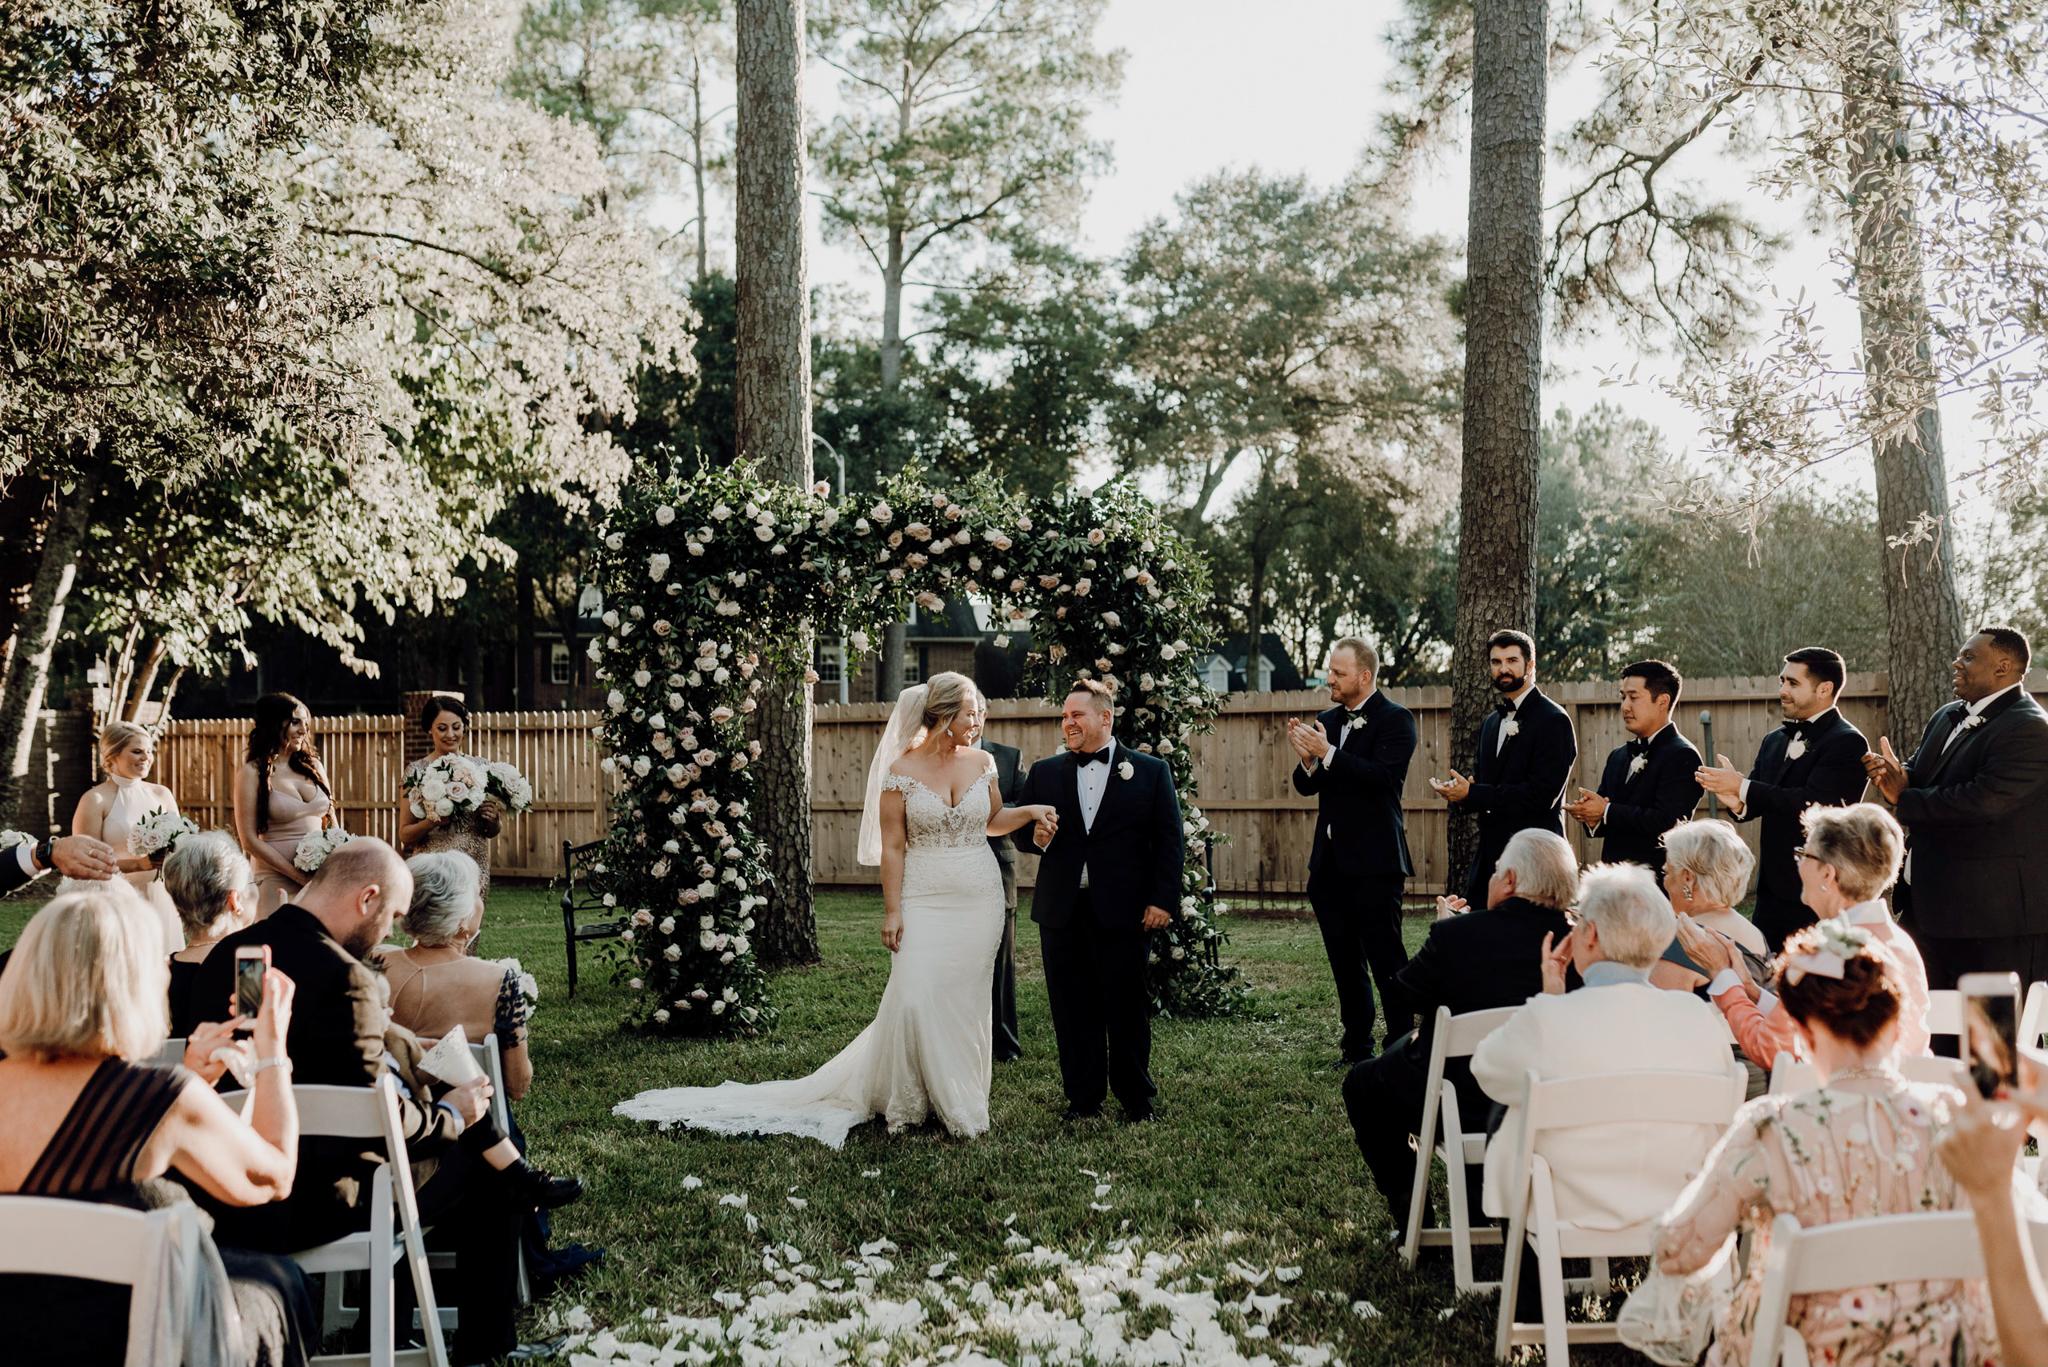 Houston Wedding Photographer-Intimate Texas Backyard Wedding- Houston Wedding Photographer -Kristen Giles Photography-47.jpg